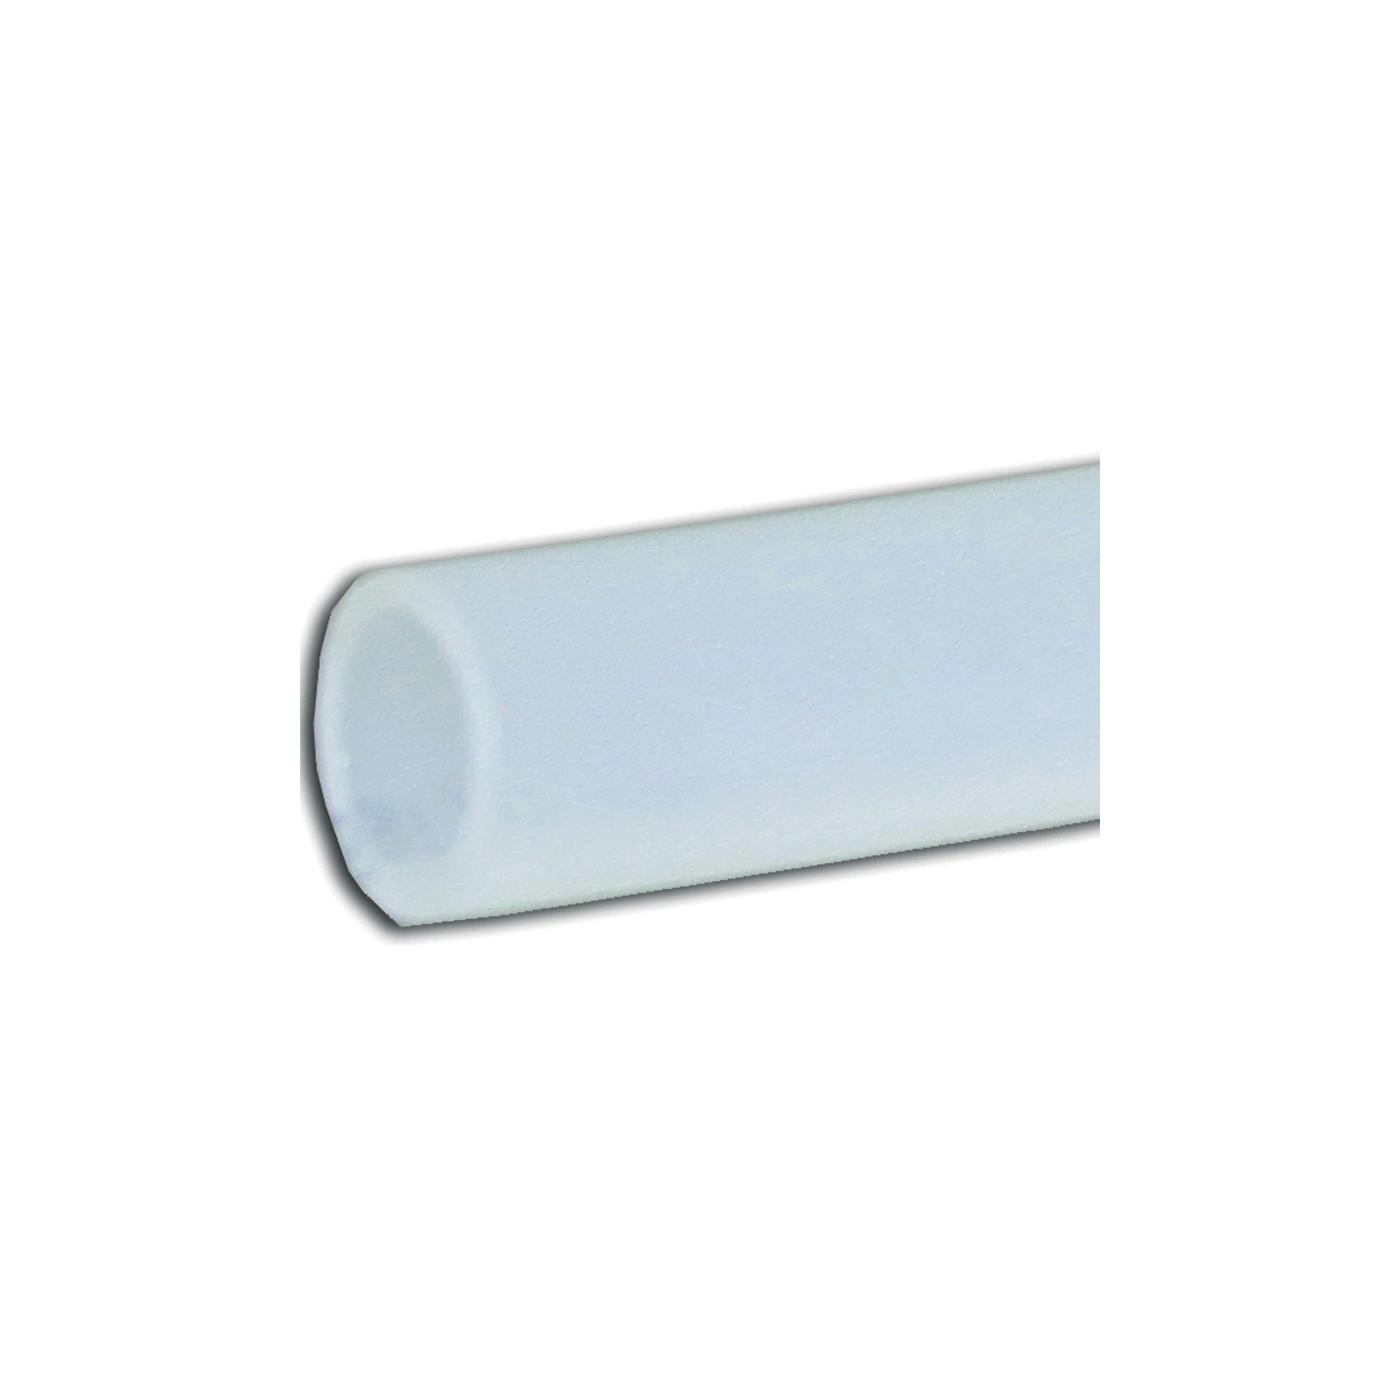 Picture of UDP T16 Series T16004001/9001P Tubing, Plastic, Translucent Milky White, 100 ft L